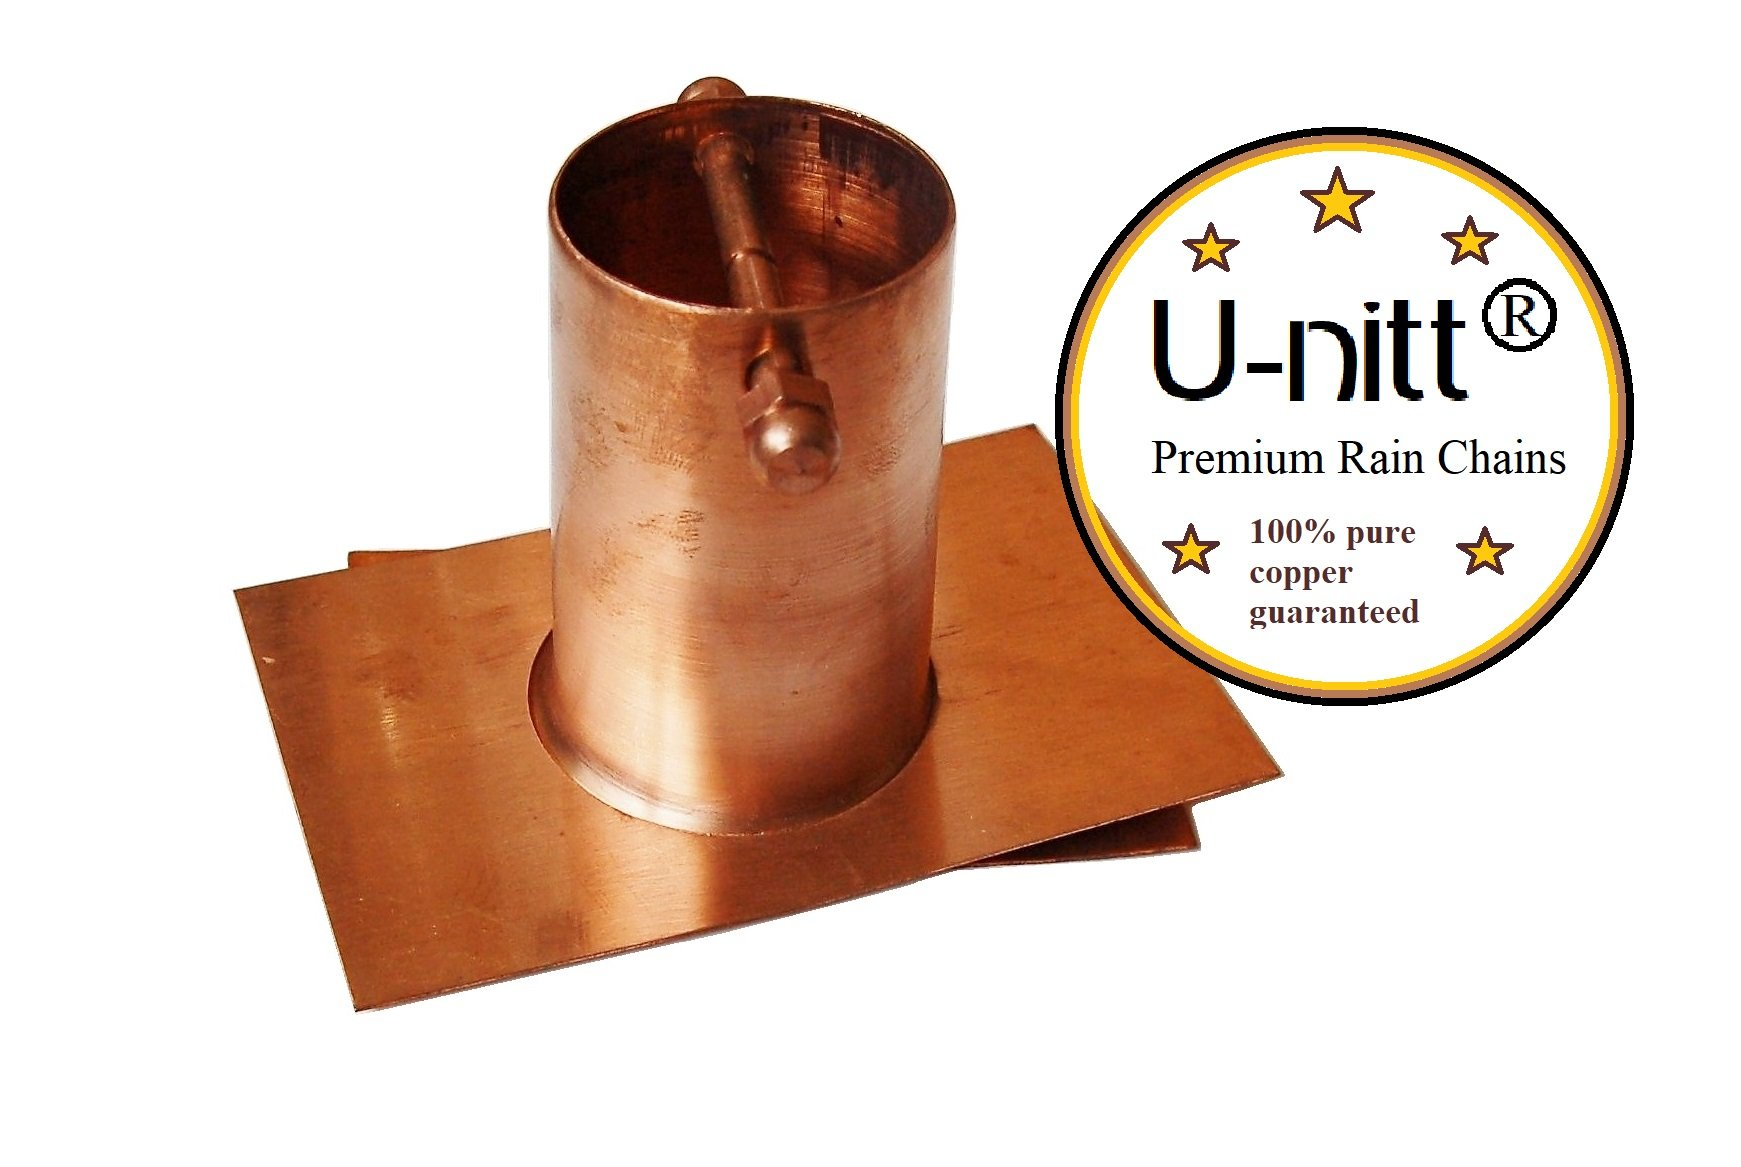 U-nitt Pure Copper Gutter Installer/Adapter for Rain Chain: #975